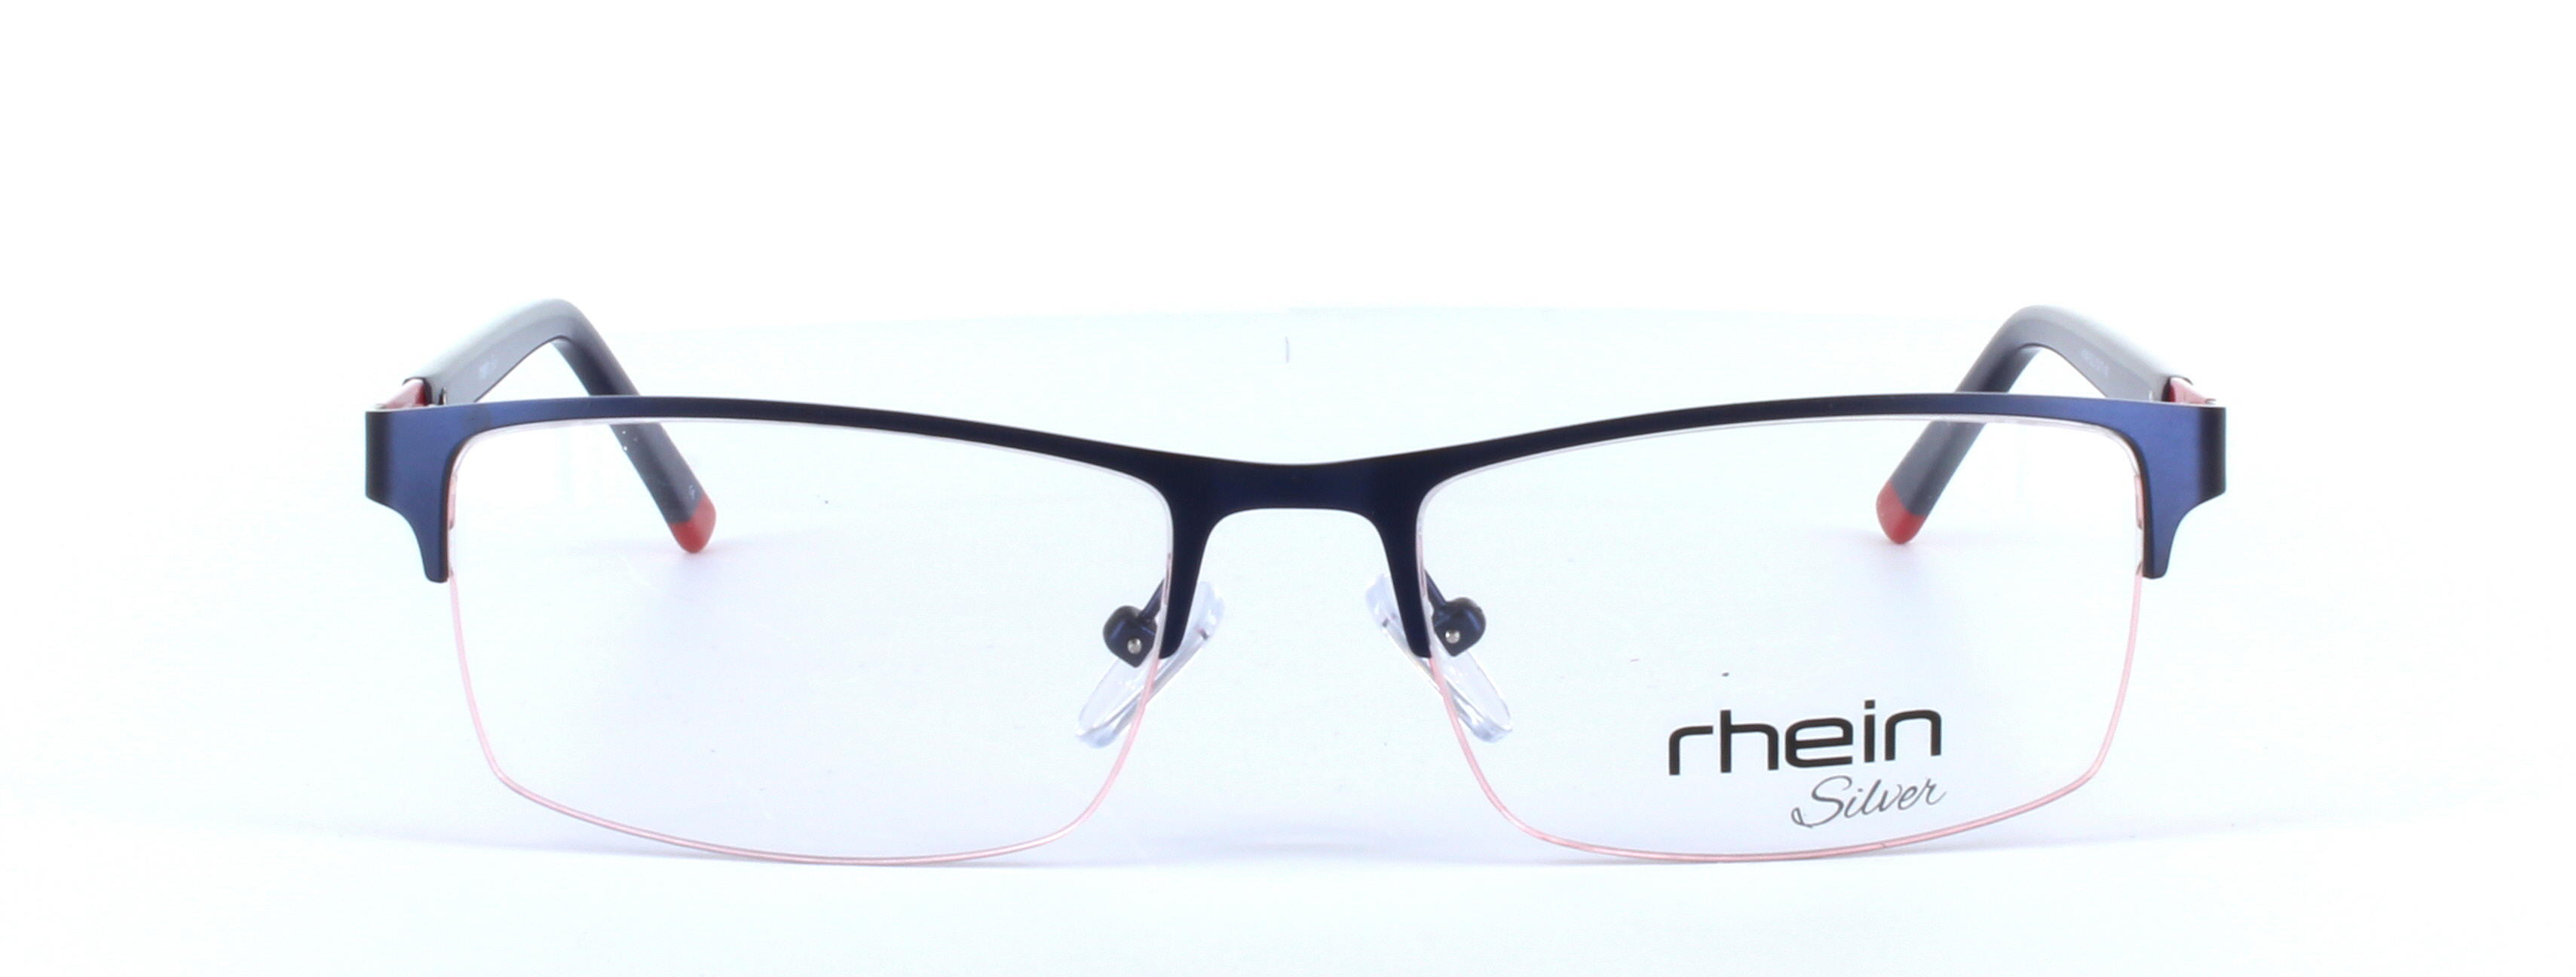 6a1875b8f6 Glance Rimless Sunglasses